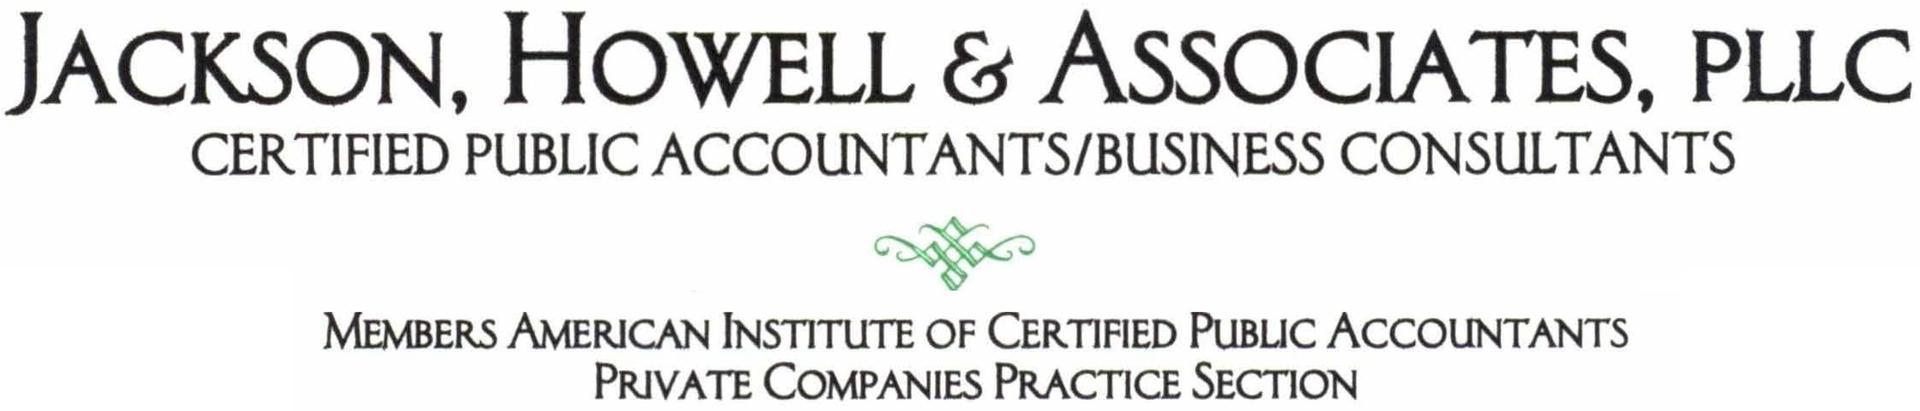 Jackson Howell and Associates, PLLC logo